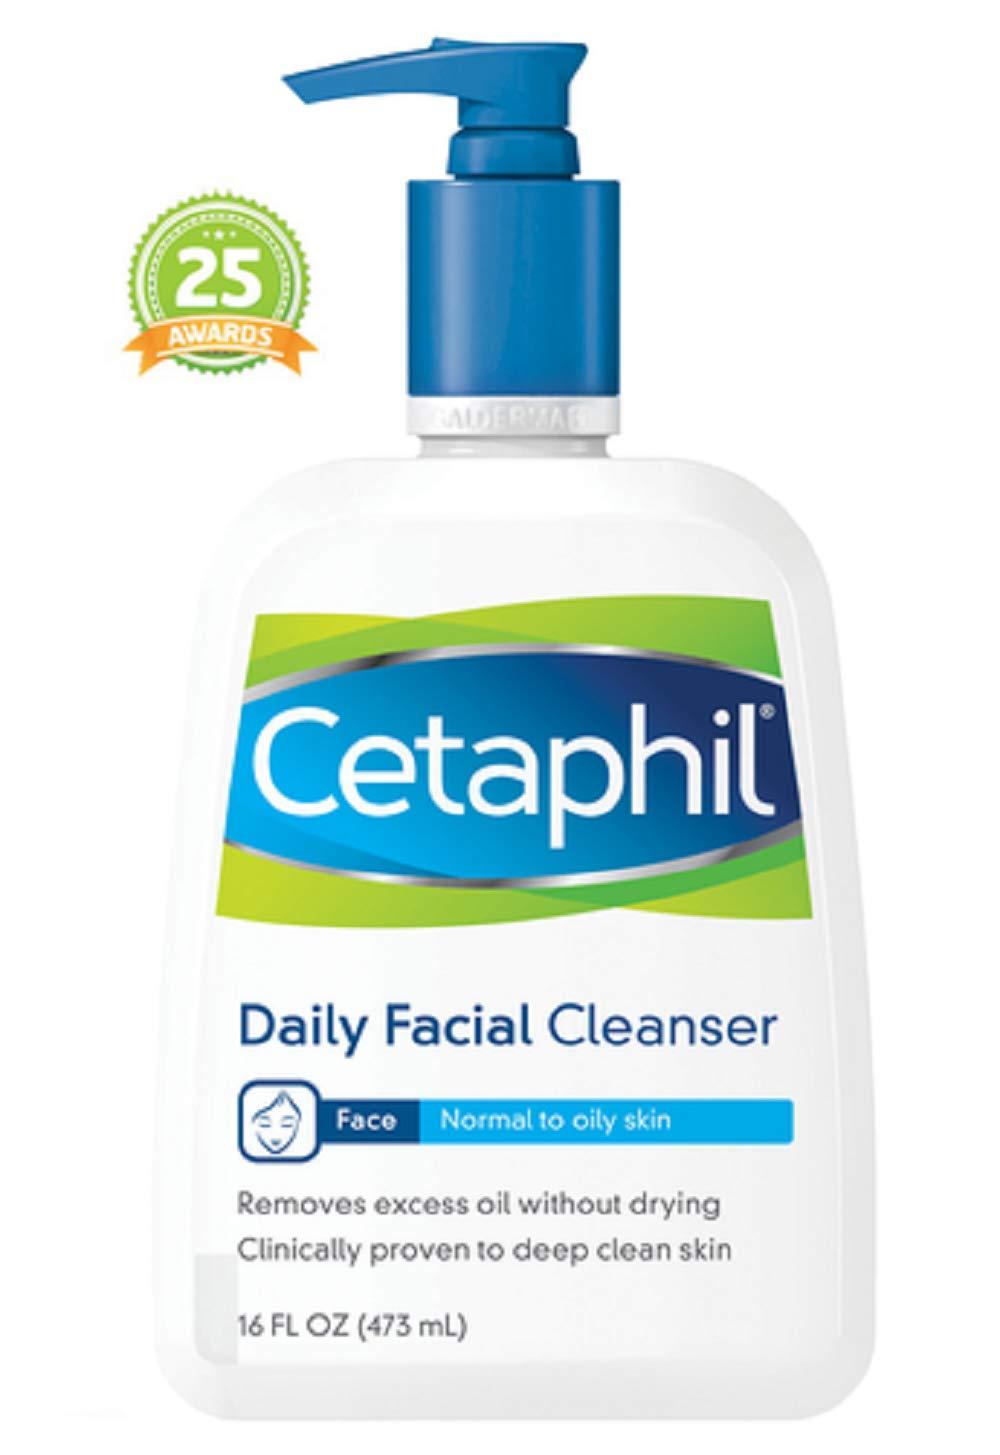 Cetaphil 5パック オールスキンタイプジェントルスキンクレンザー16オズ(5パック) Cetaphil 5パック 5パック 5パック B01IA9BSNU, まじめな トナー ショップ:b629ec93 --- forums.joybit.com